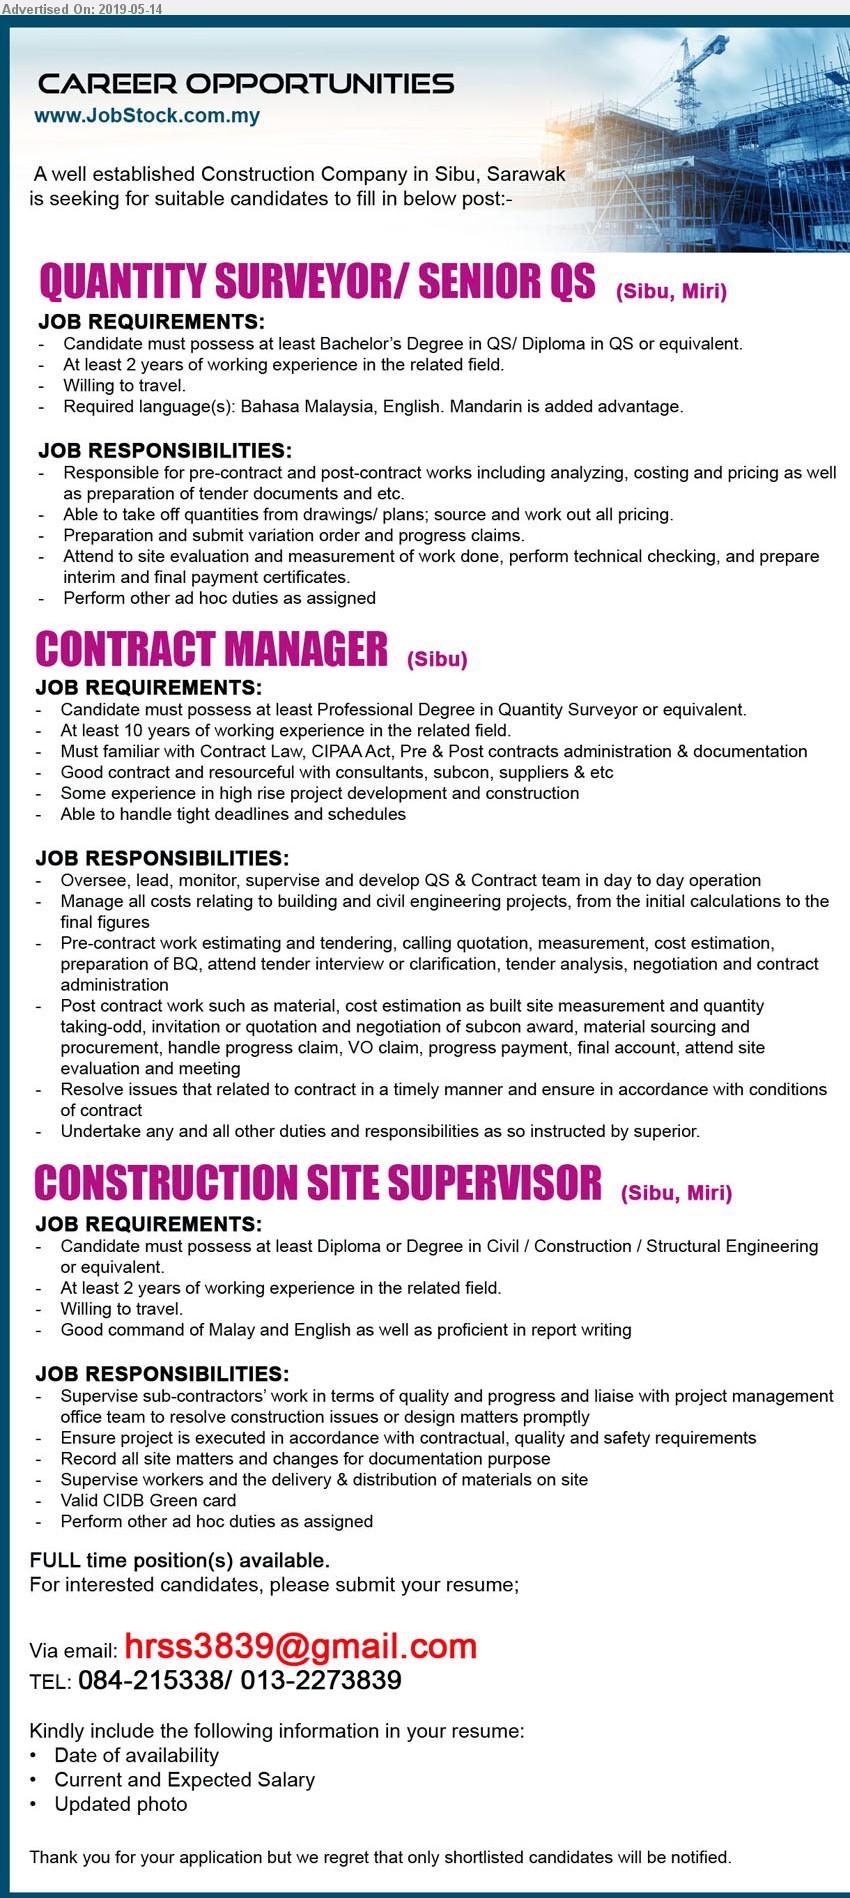 Advertisement Detail - ADVERTISER (Construction Company)